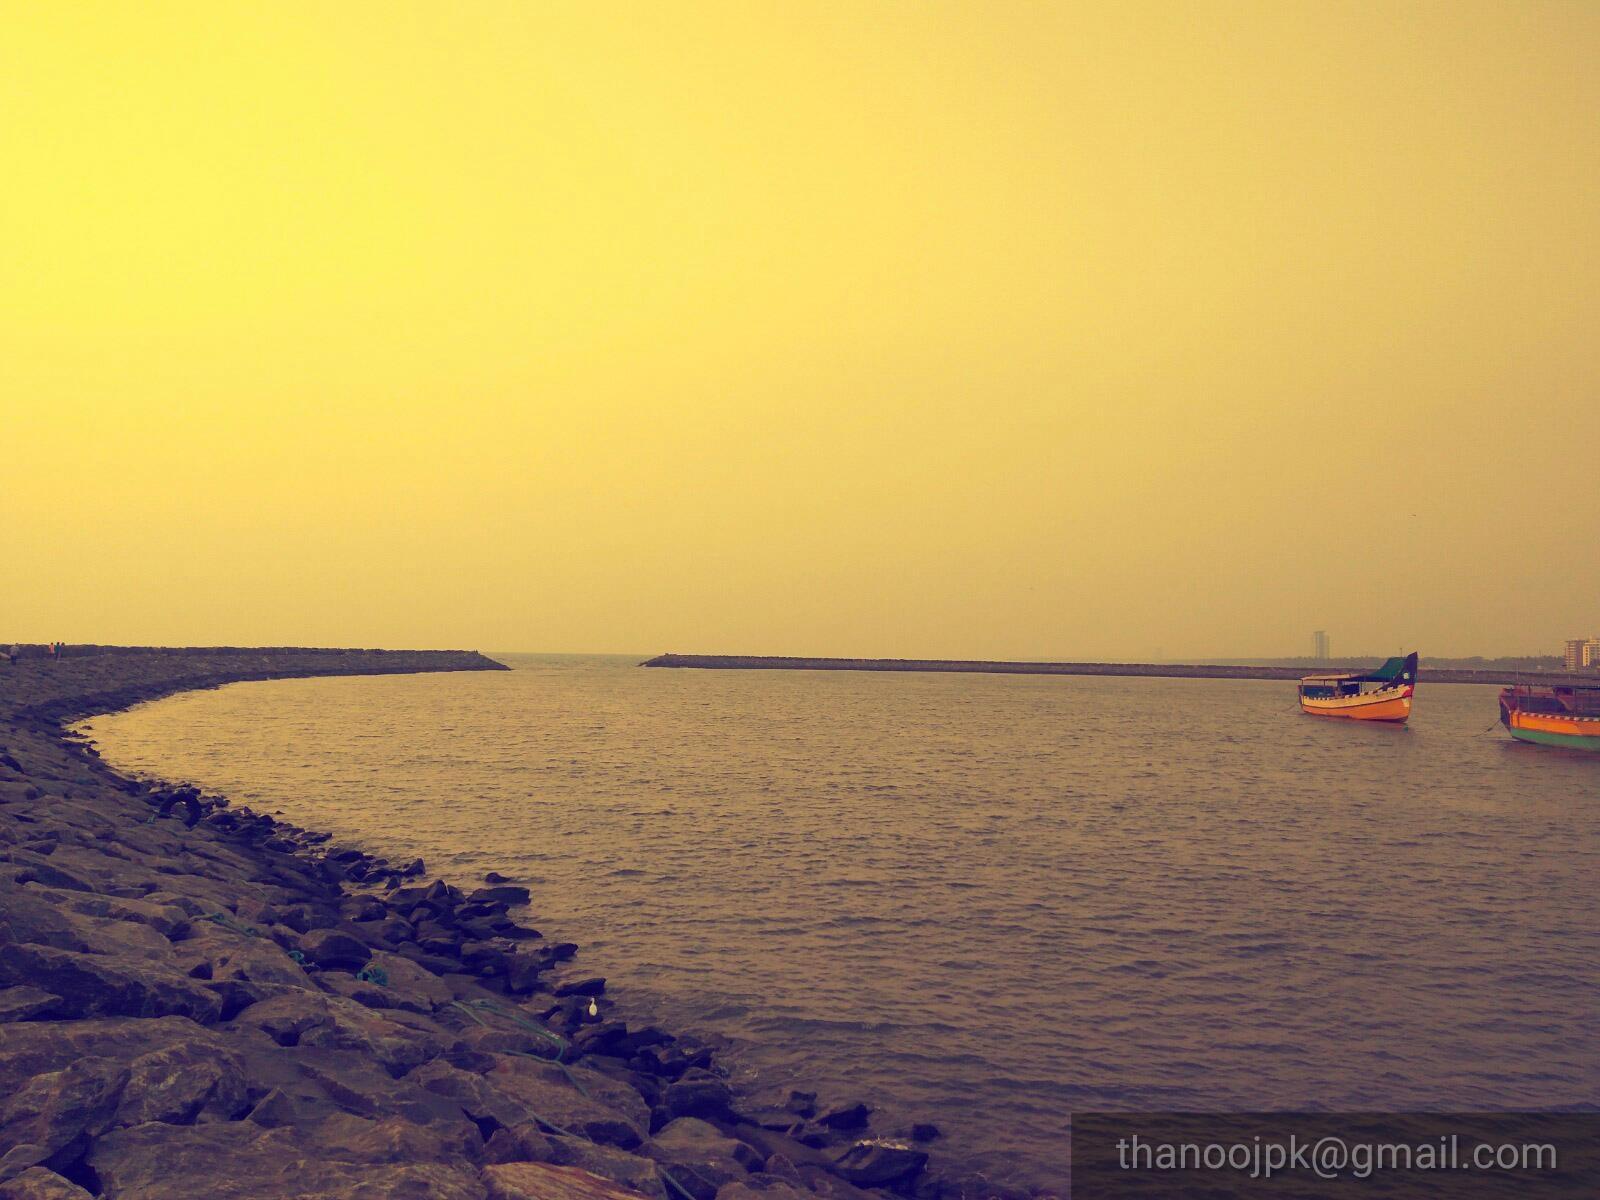 Calicut beach, Kerala by thanoojpk